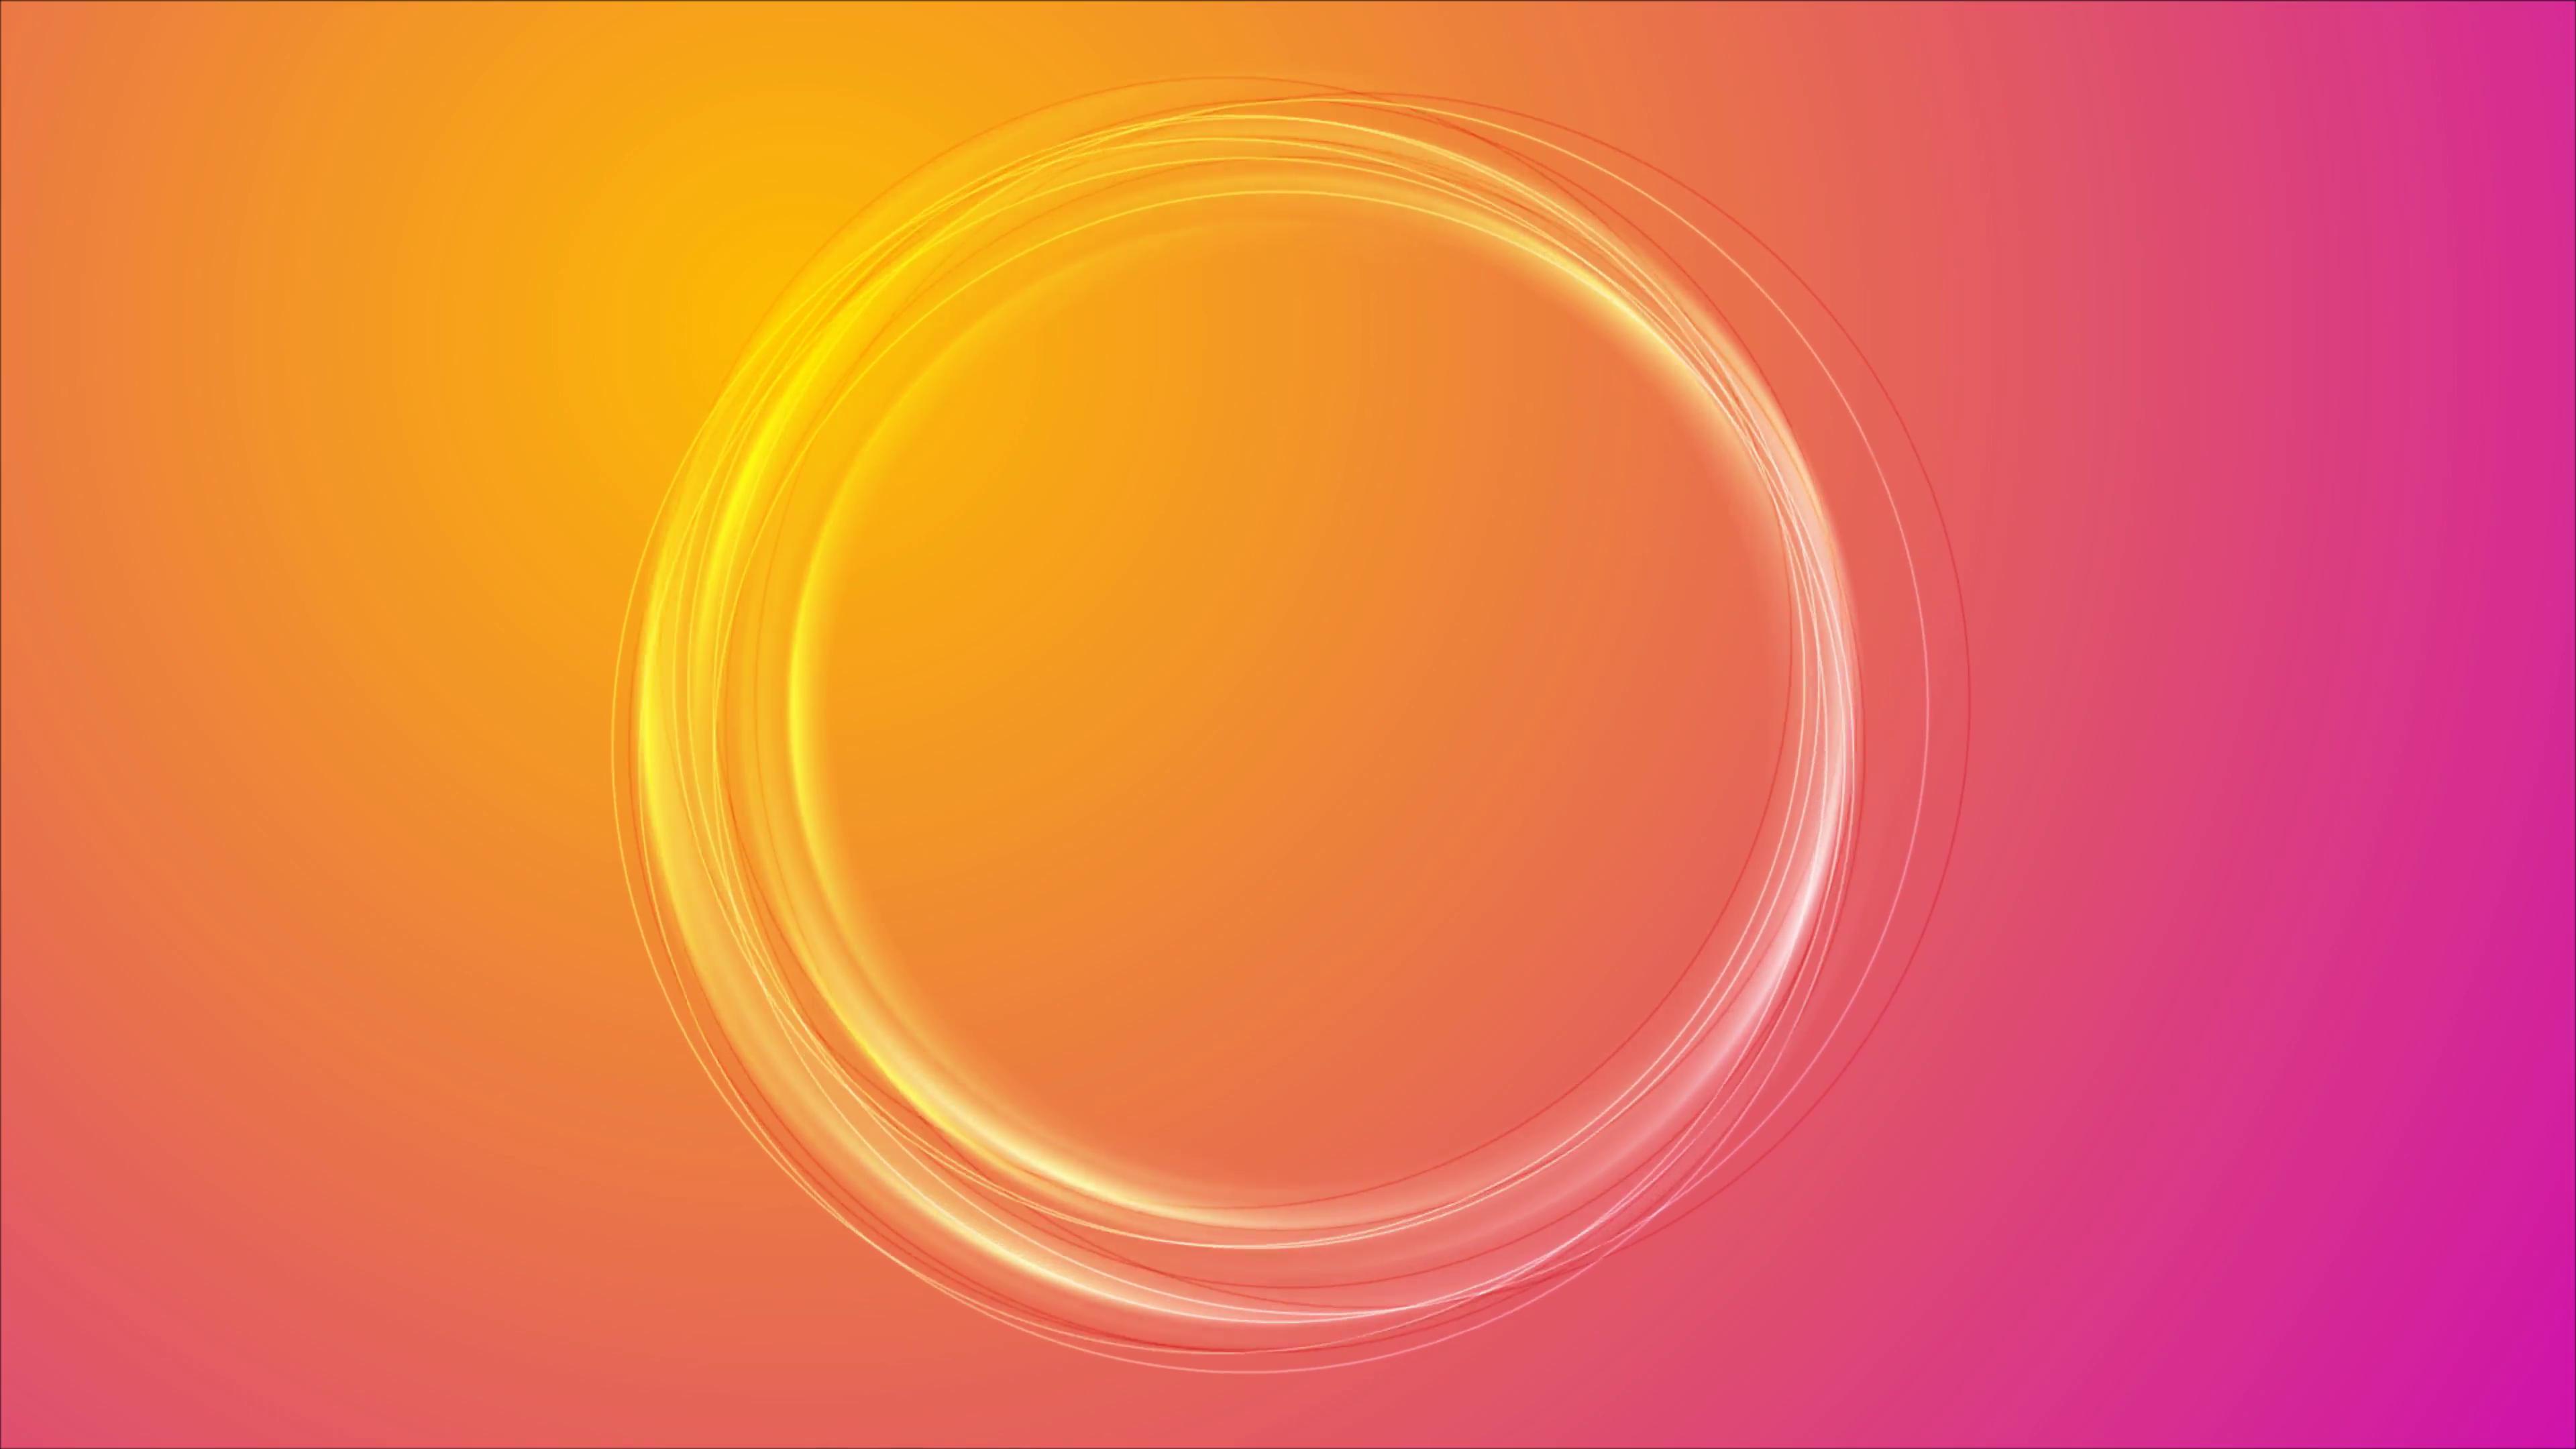 Circle Shape PNG HD - 142119